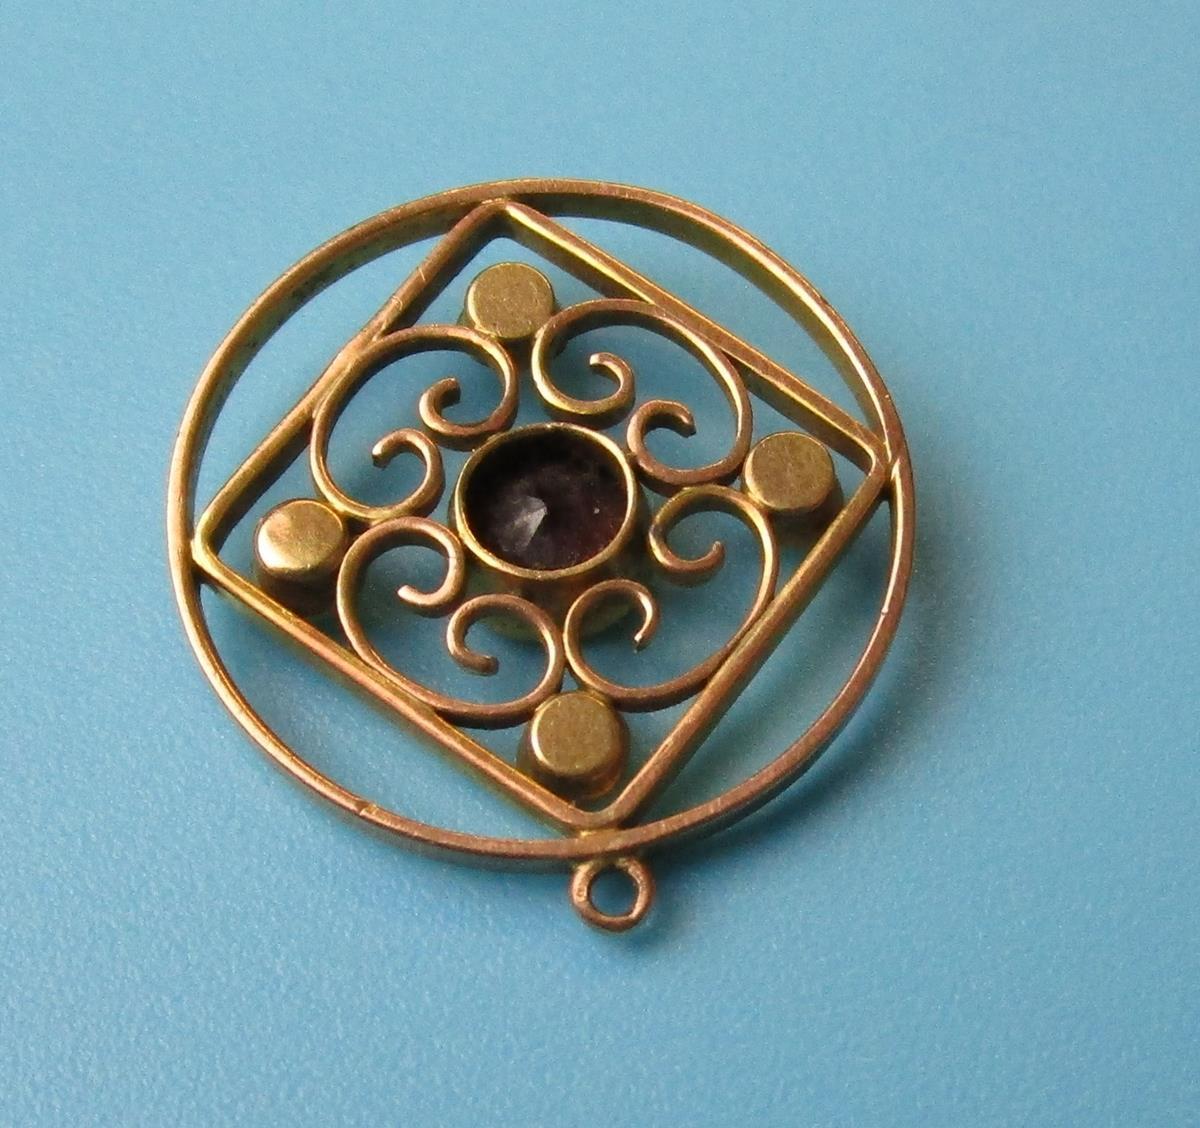 Antique gold garnet & pearl pendant - Image 2 of 3